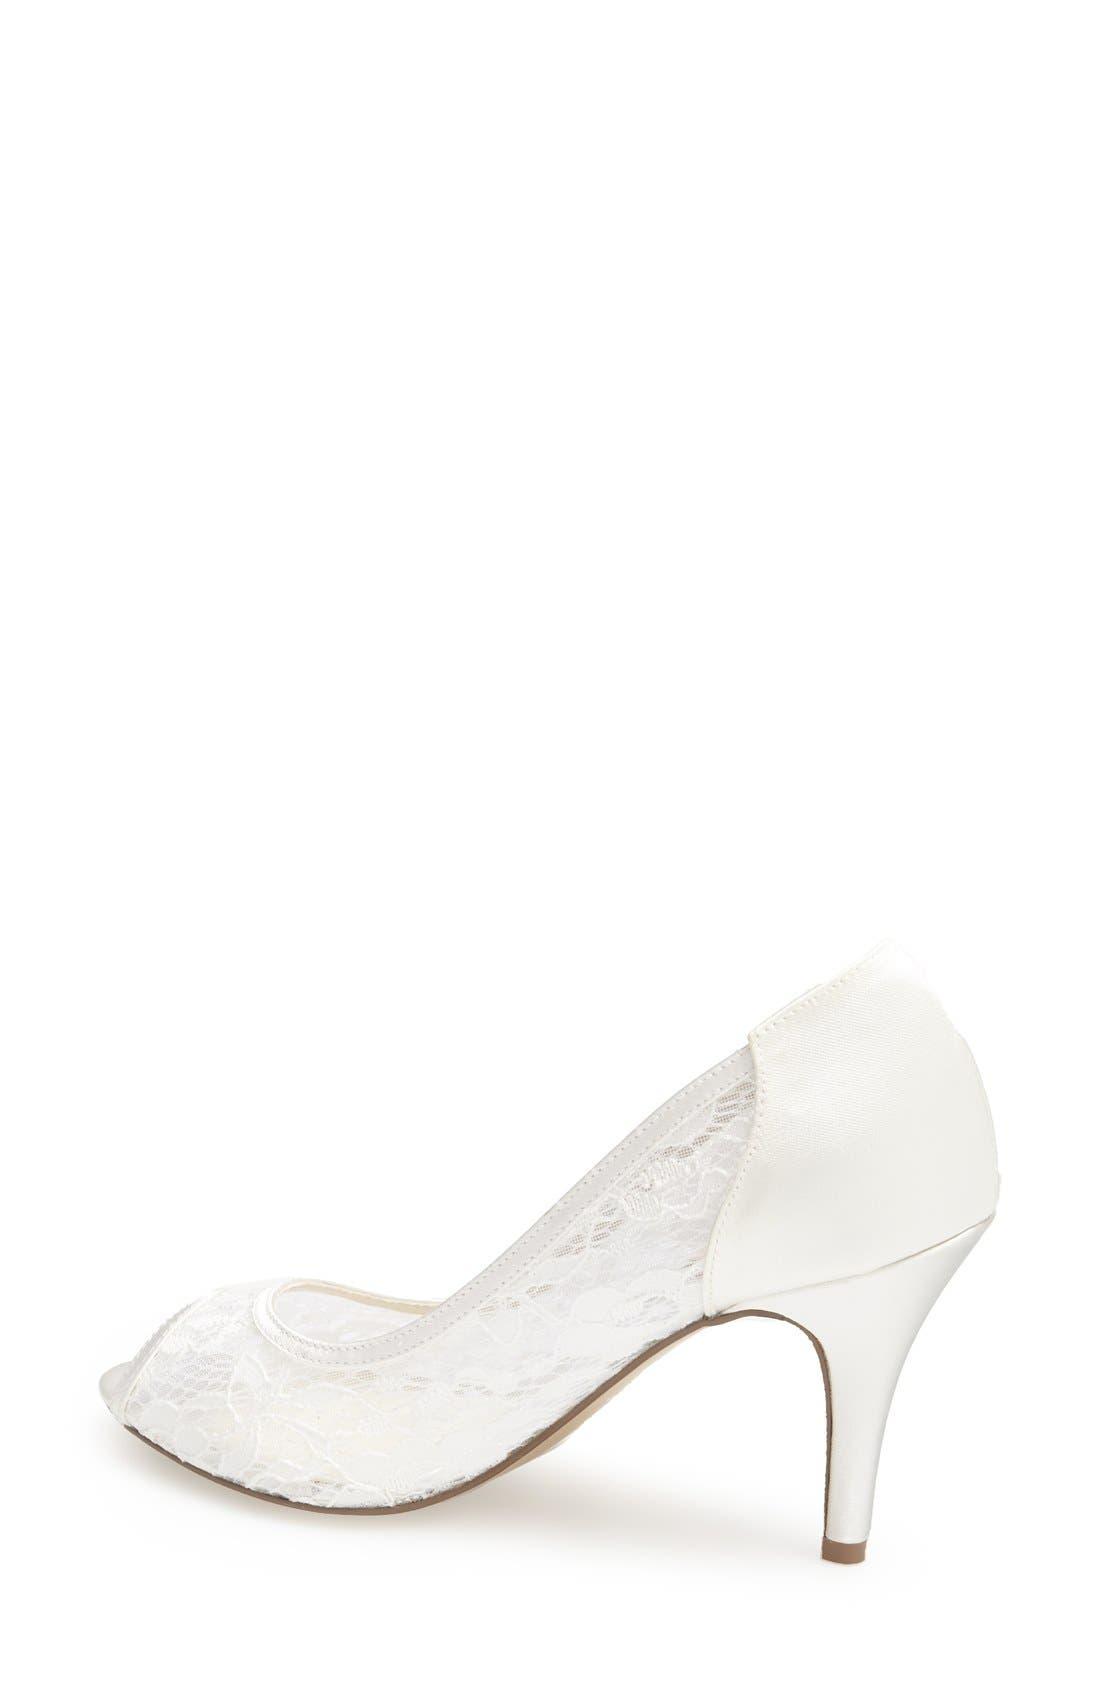 'Scrumptious' Lace Peep Toe Sandal,                             Alternate thumbnail 2, color,                             IVORY MESH LACE